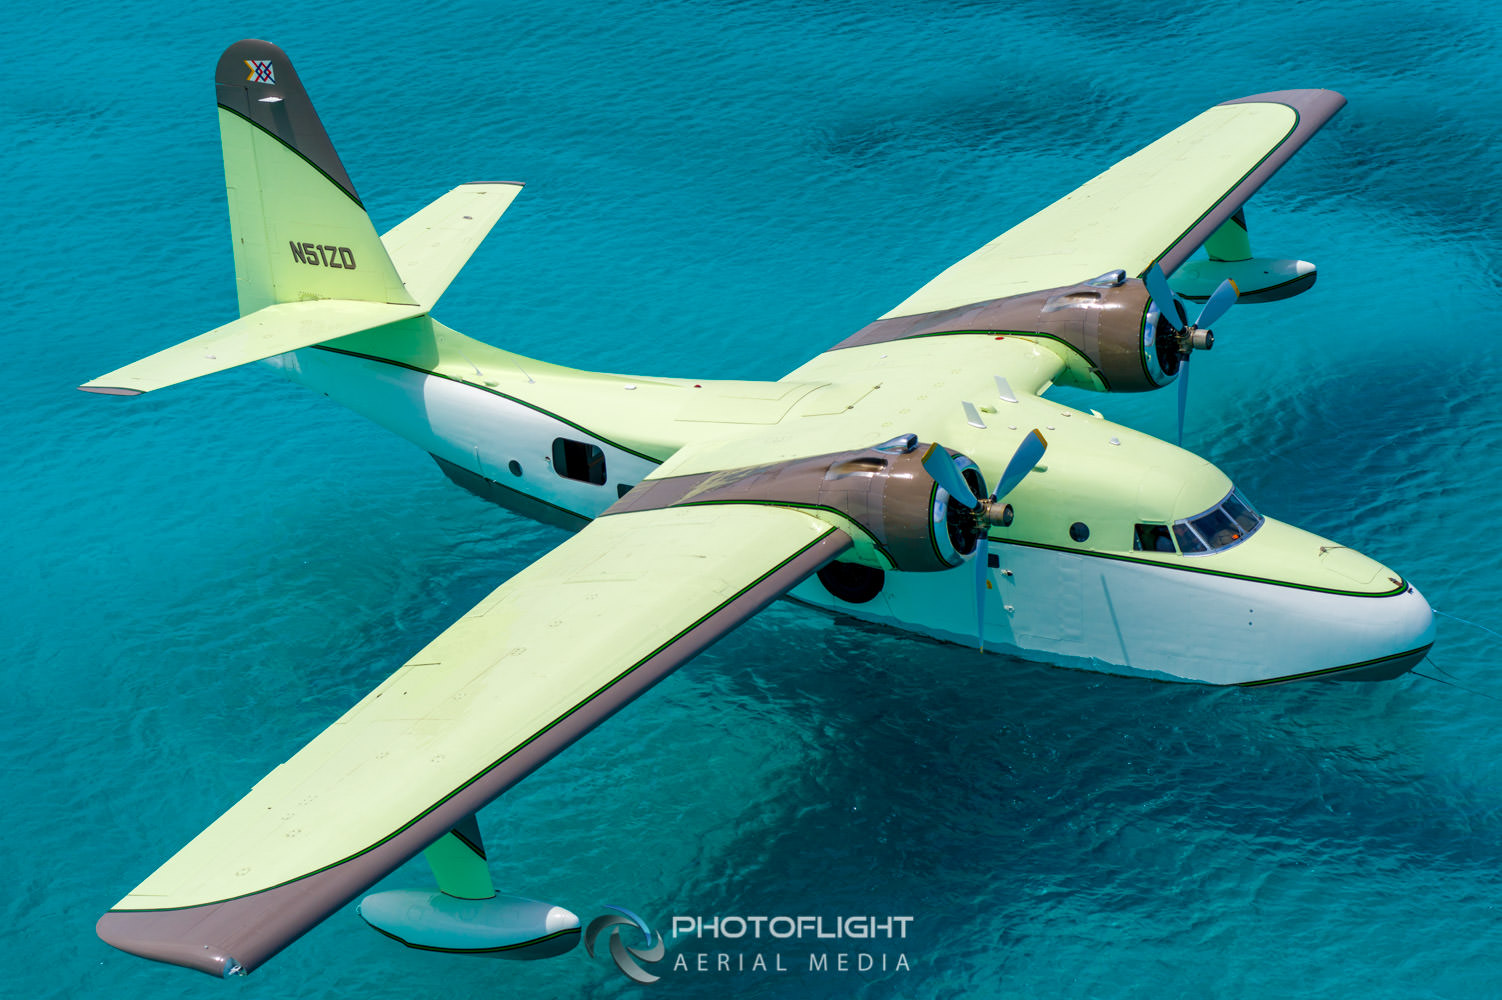 Flying Boat Grumman Albatross, drone photography by Photoflight Aerial Media. Subject to copyright ©Photoflight Aerial Media